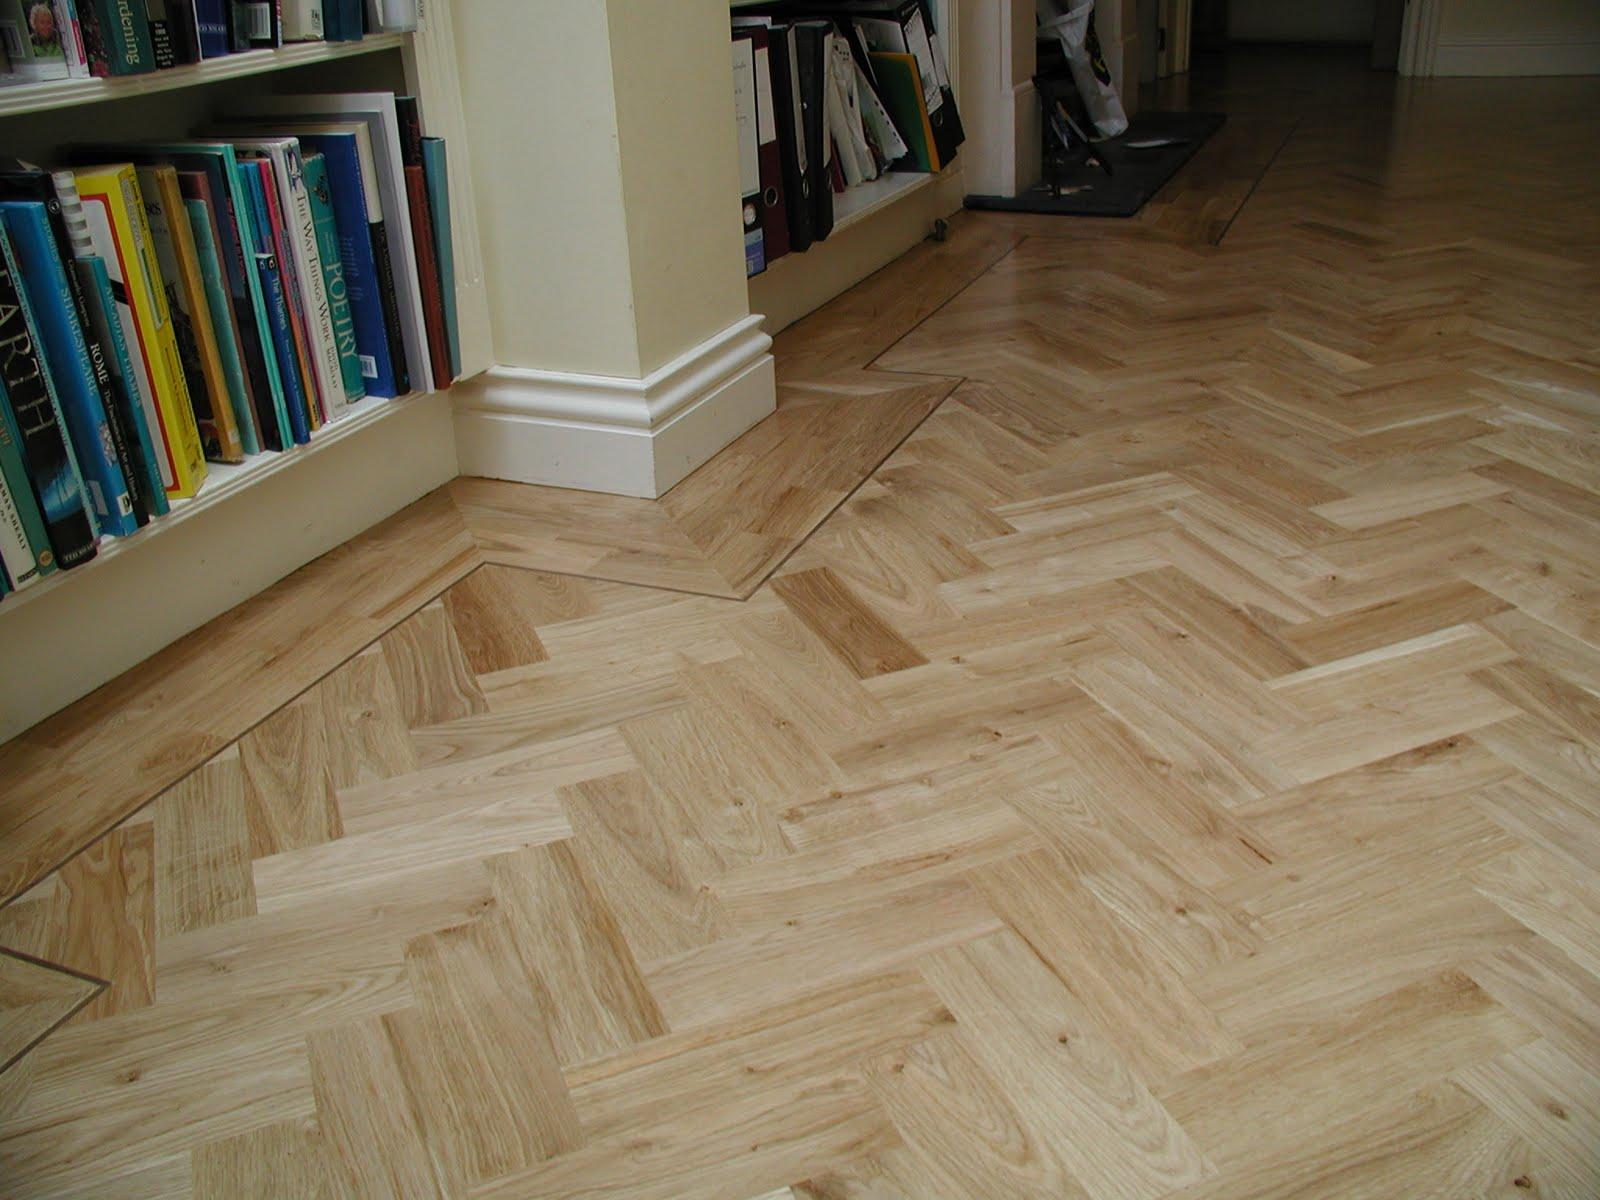 Acacia Wooden Floors Rustic Oak Herringbone Parquet